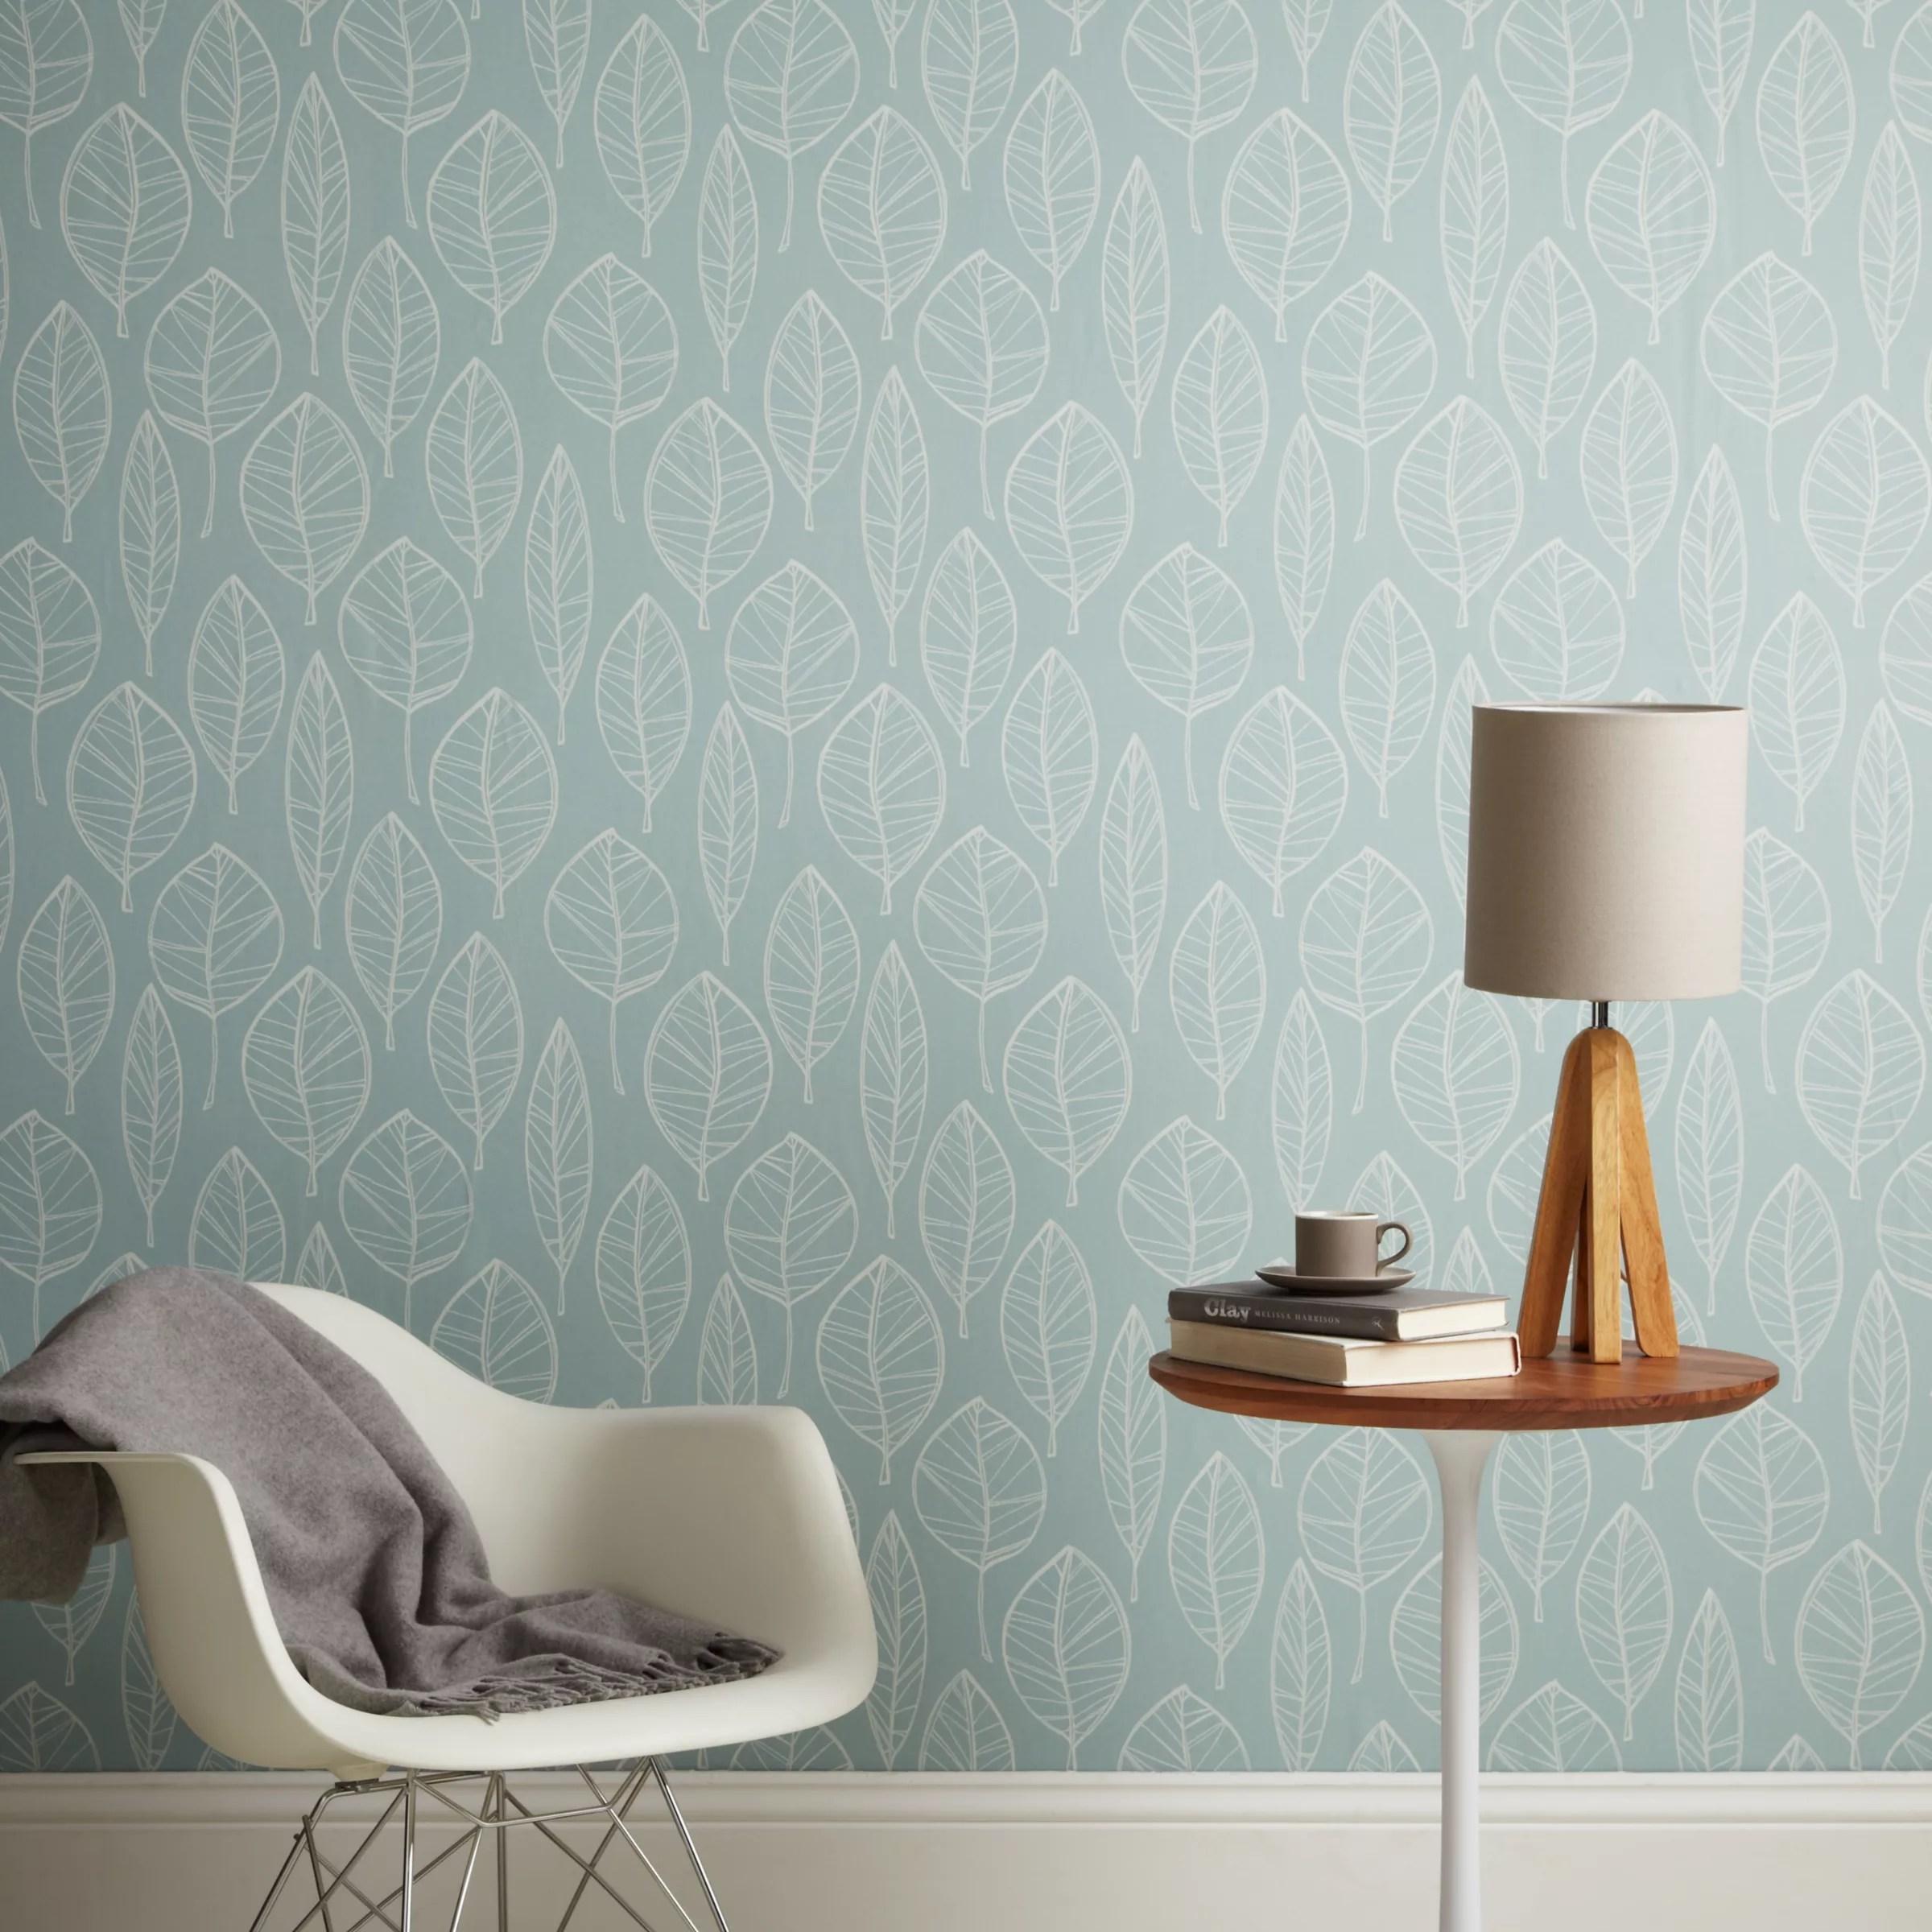 Buy John Lewis Aspen Wallpaper | John Lewis